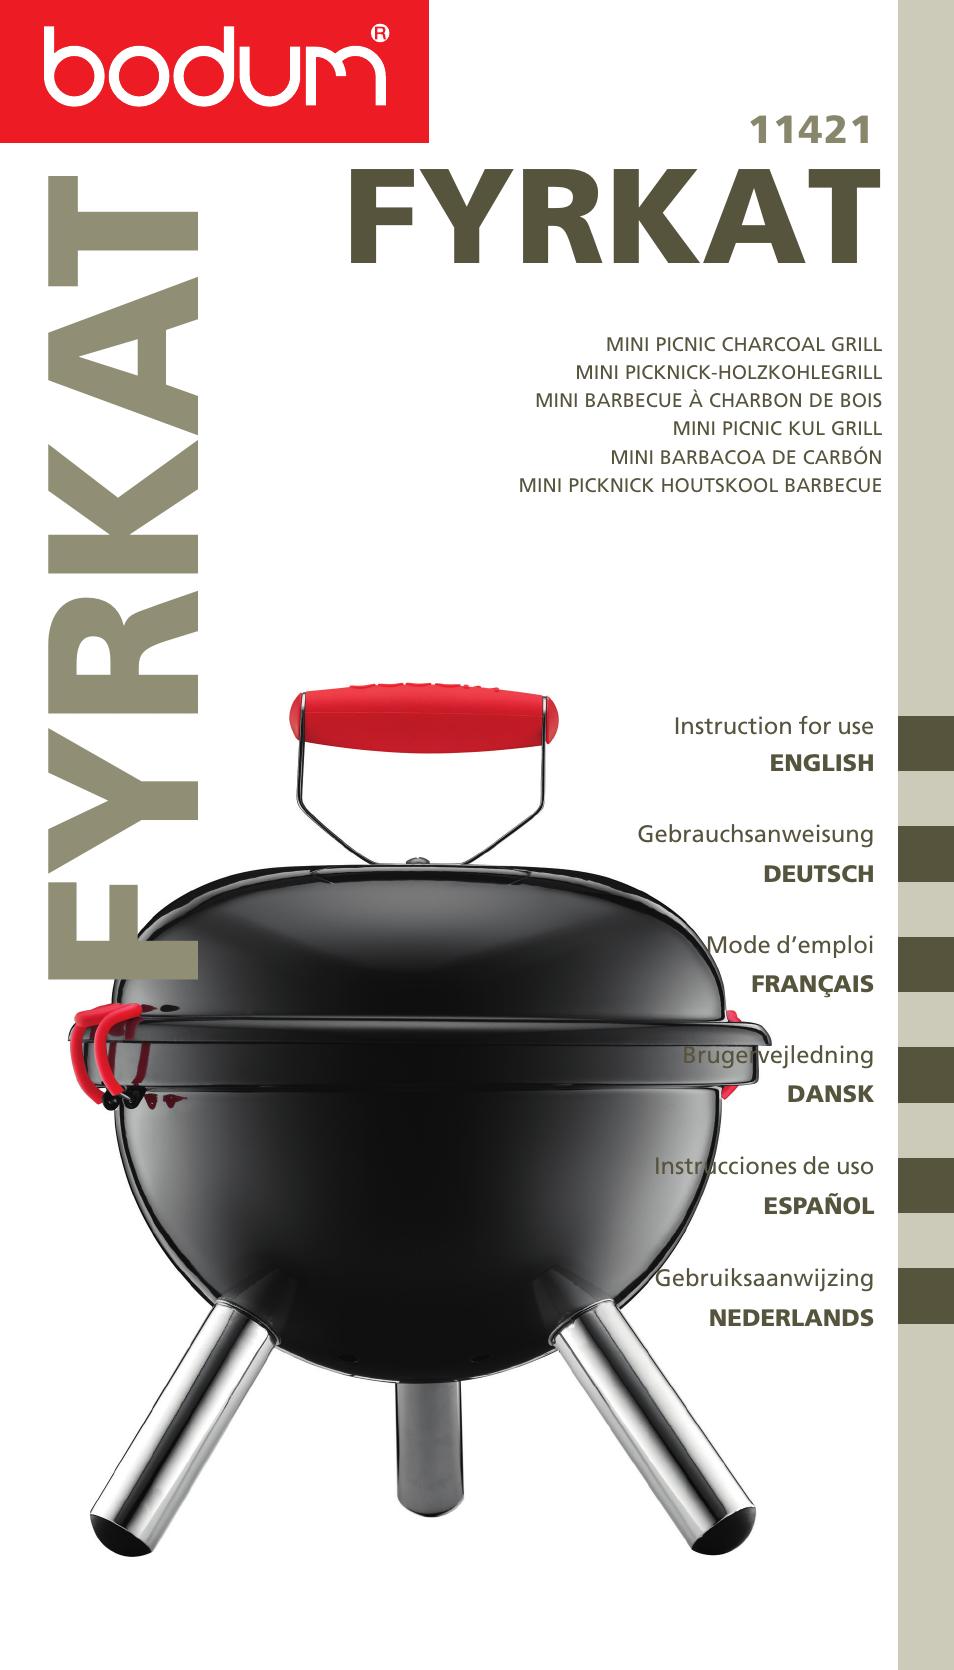 bodum mini picnic charcoal grill 11421 user manual 39 pages. Black Bedroom Furniture Sets. Home Design Ideas